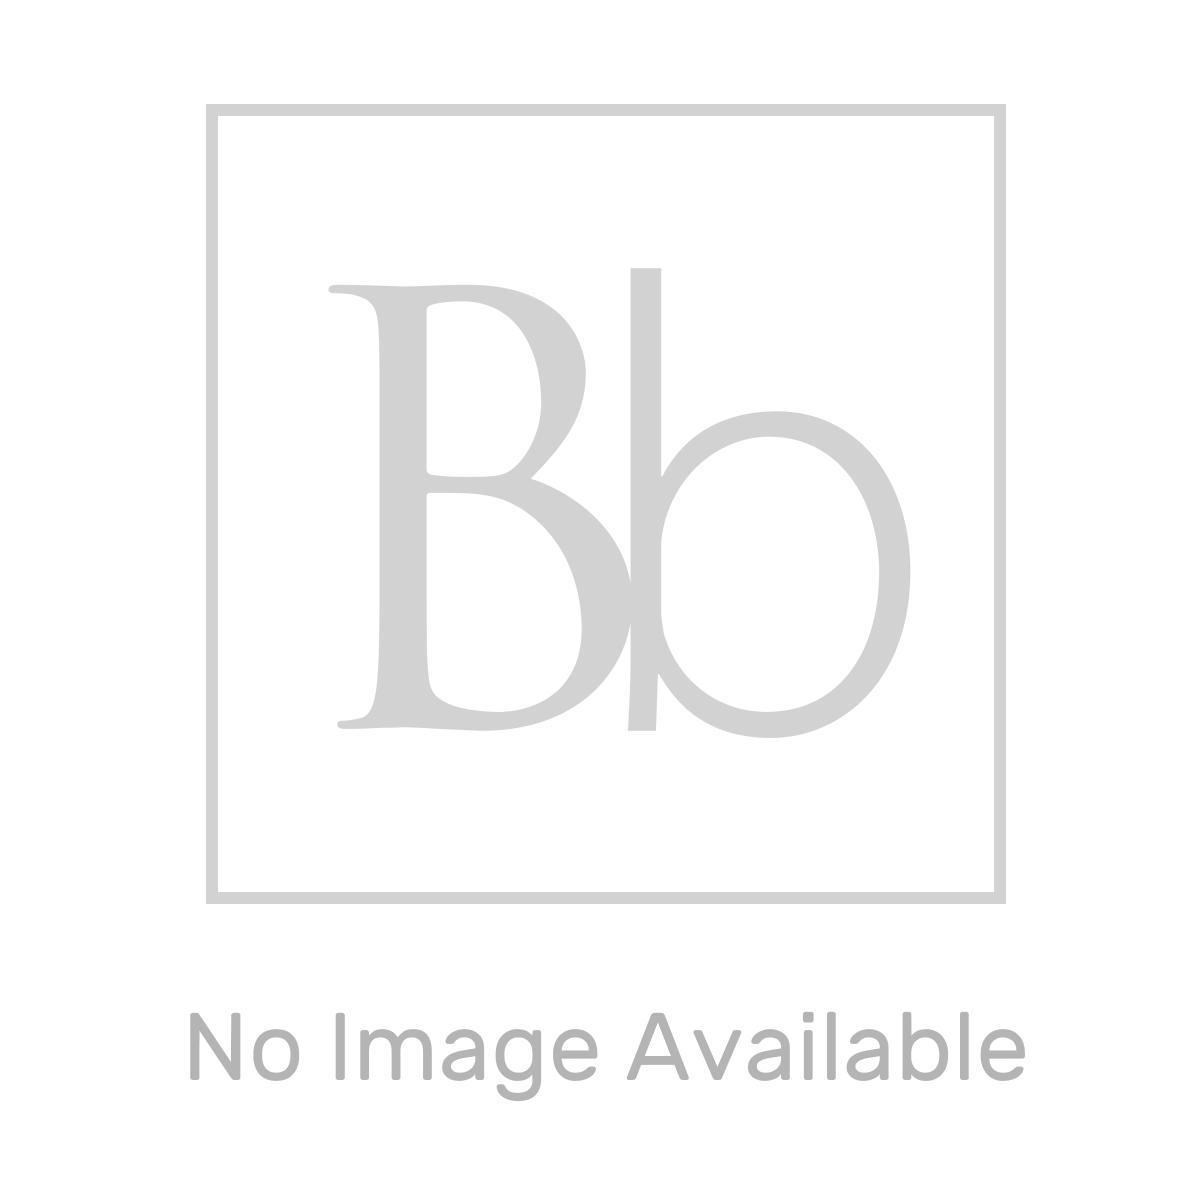 April Square Anti Slip Shower Tray 900 x 900 Line Drawing